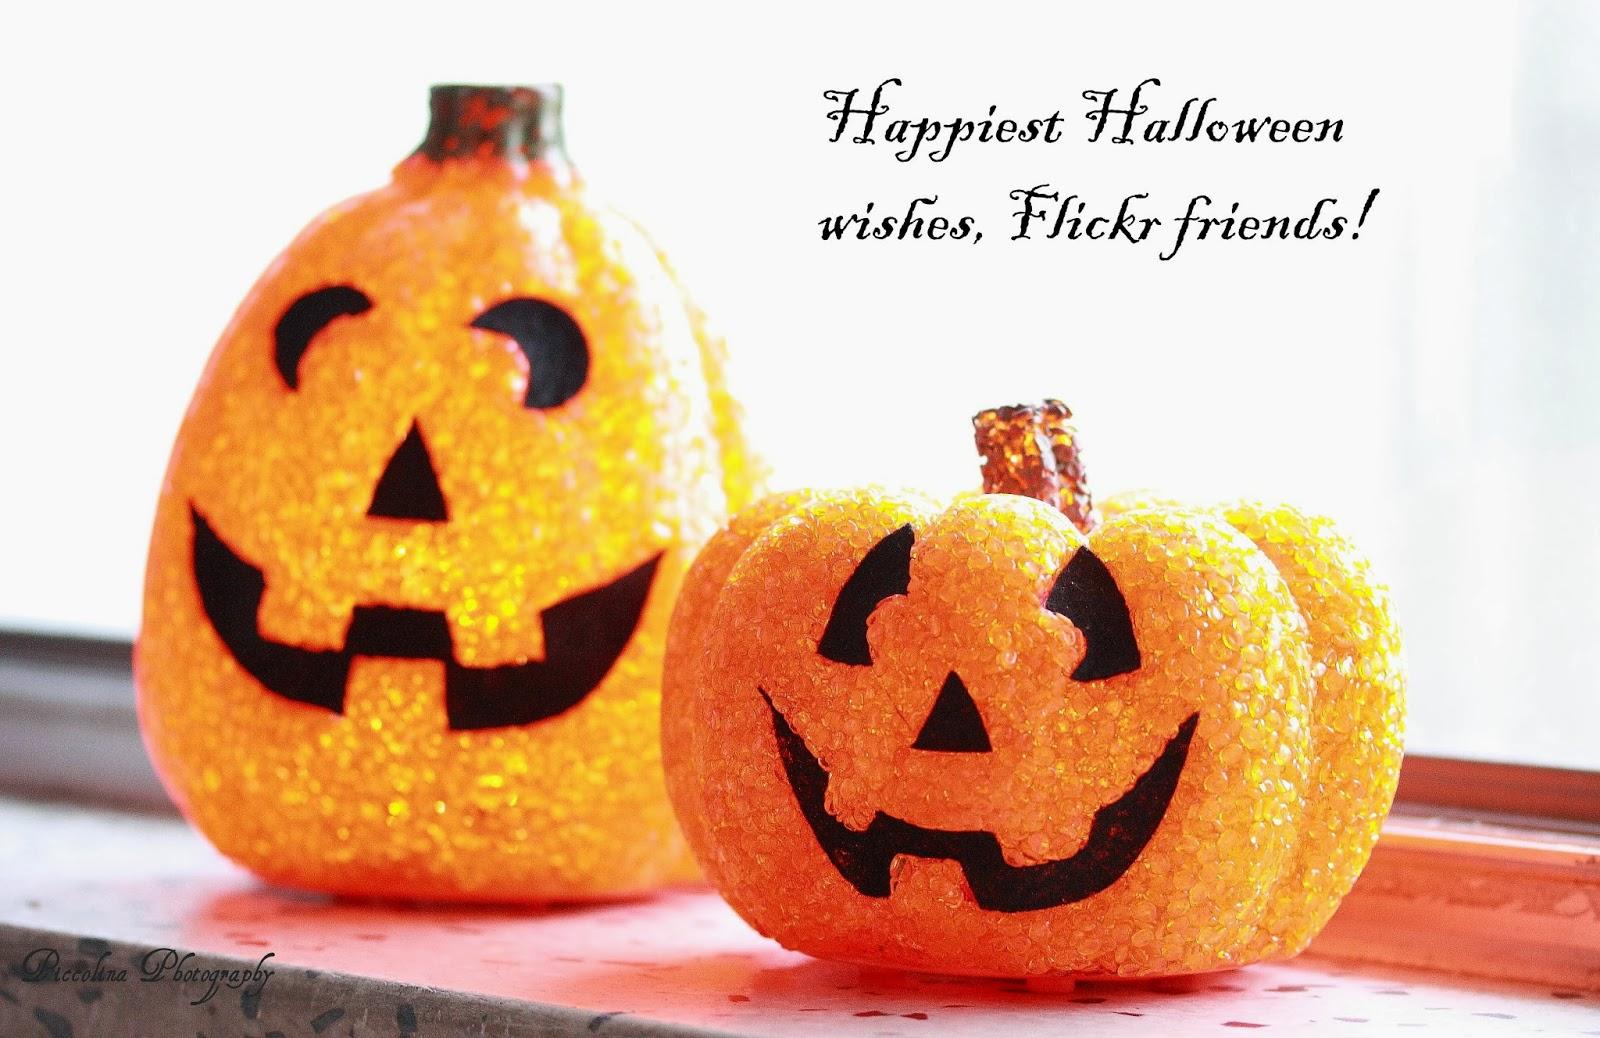 Halloween 2013 Sms Messages ~ Happy Halloween 2013